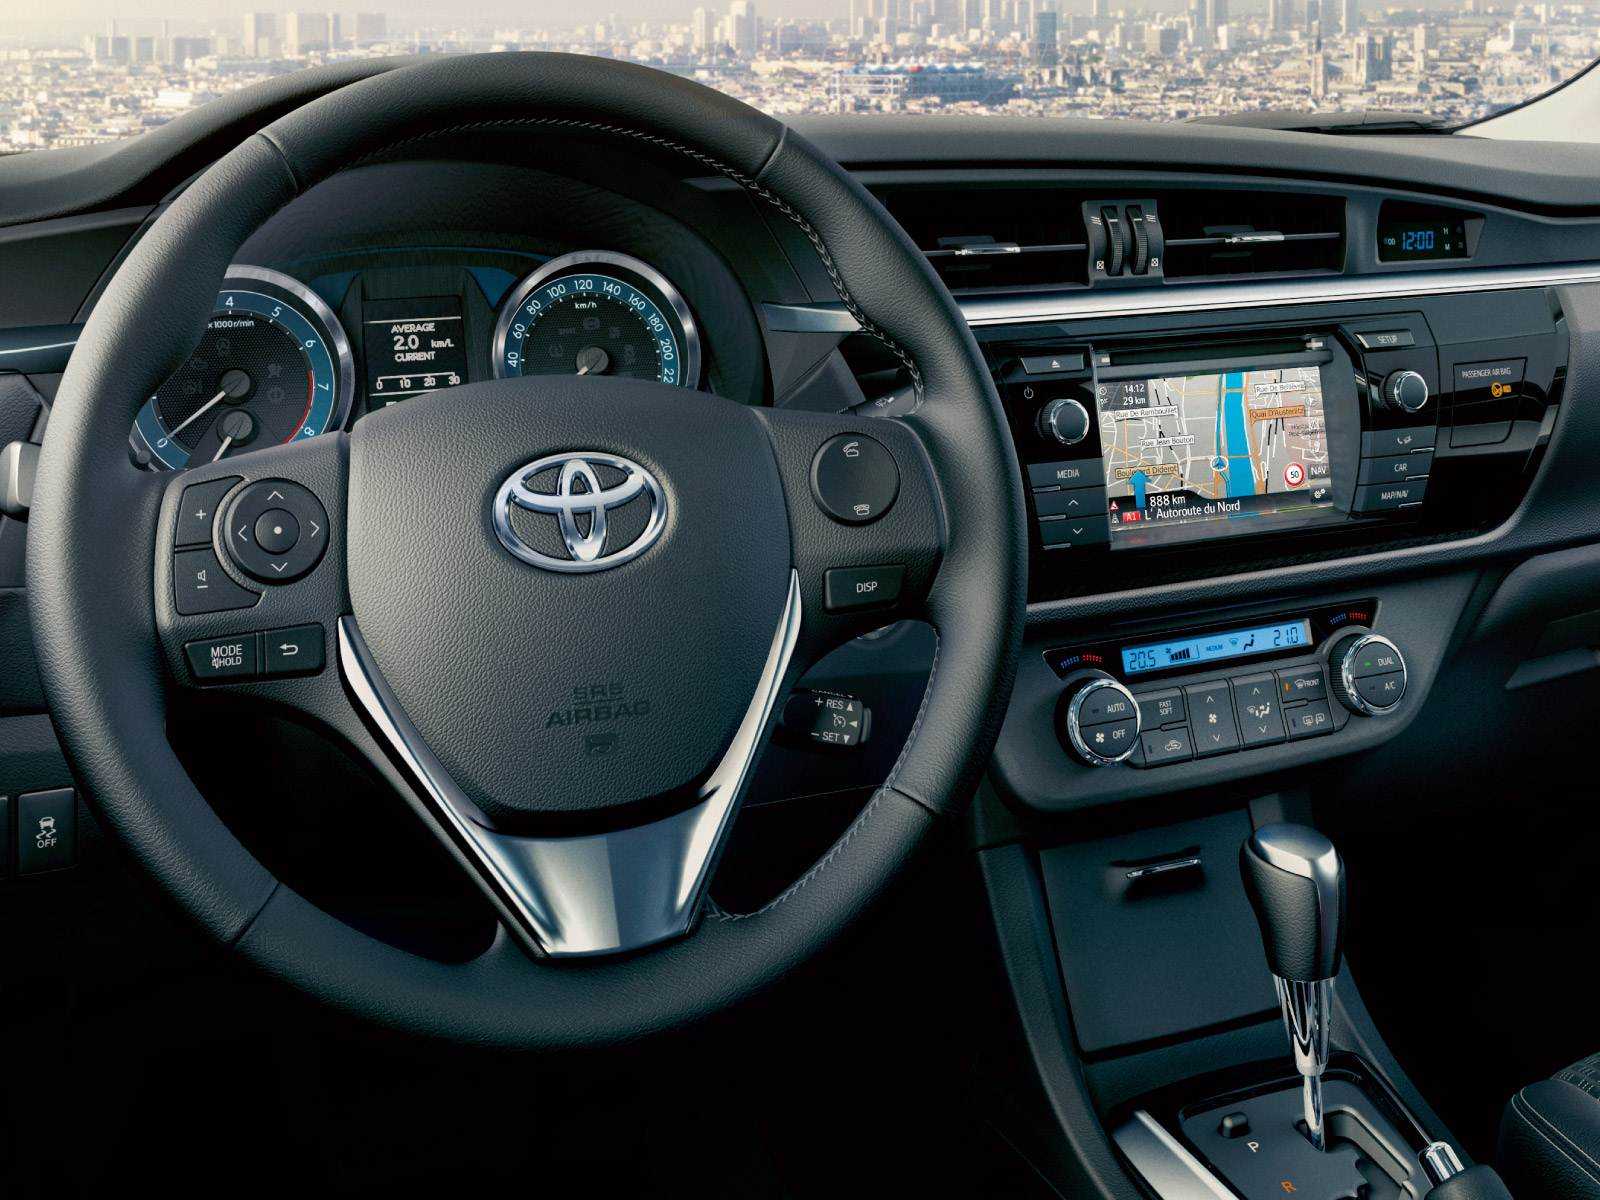 Novo Corolla 2015 - painel